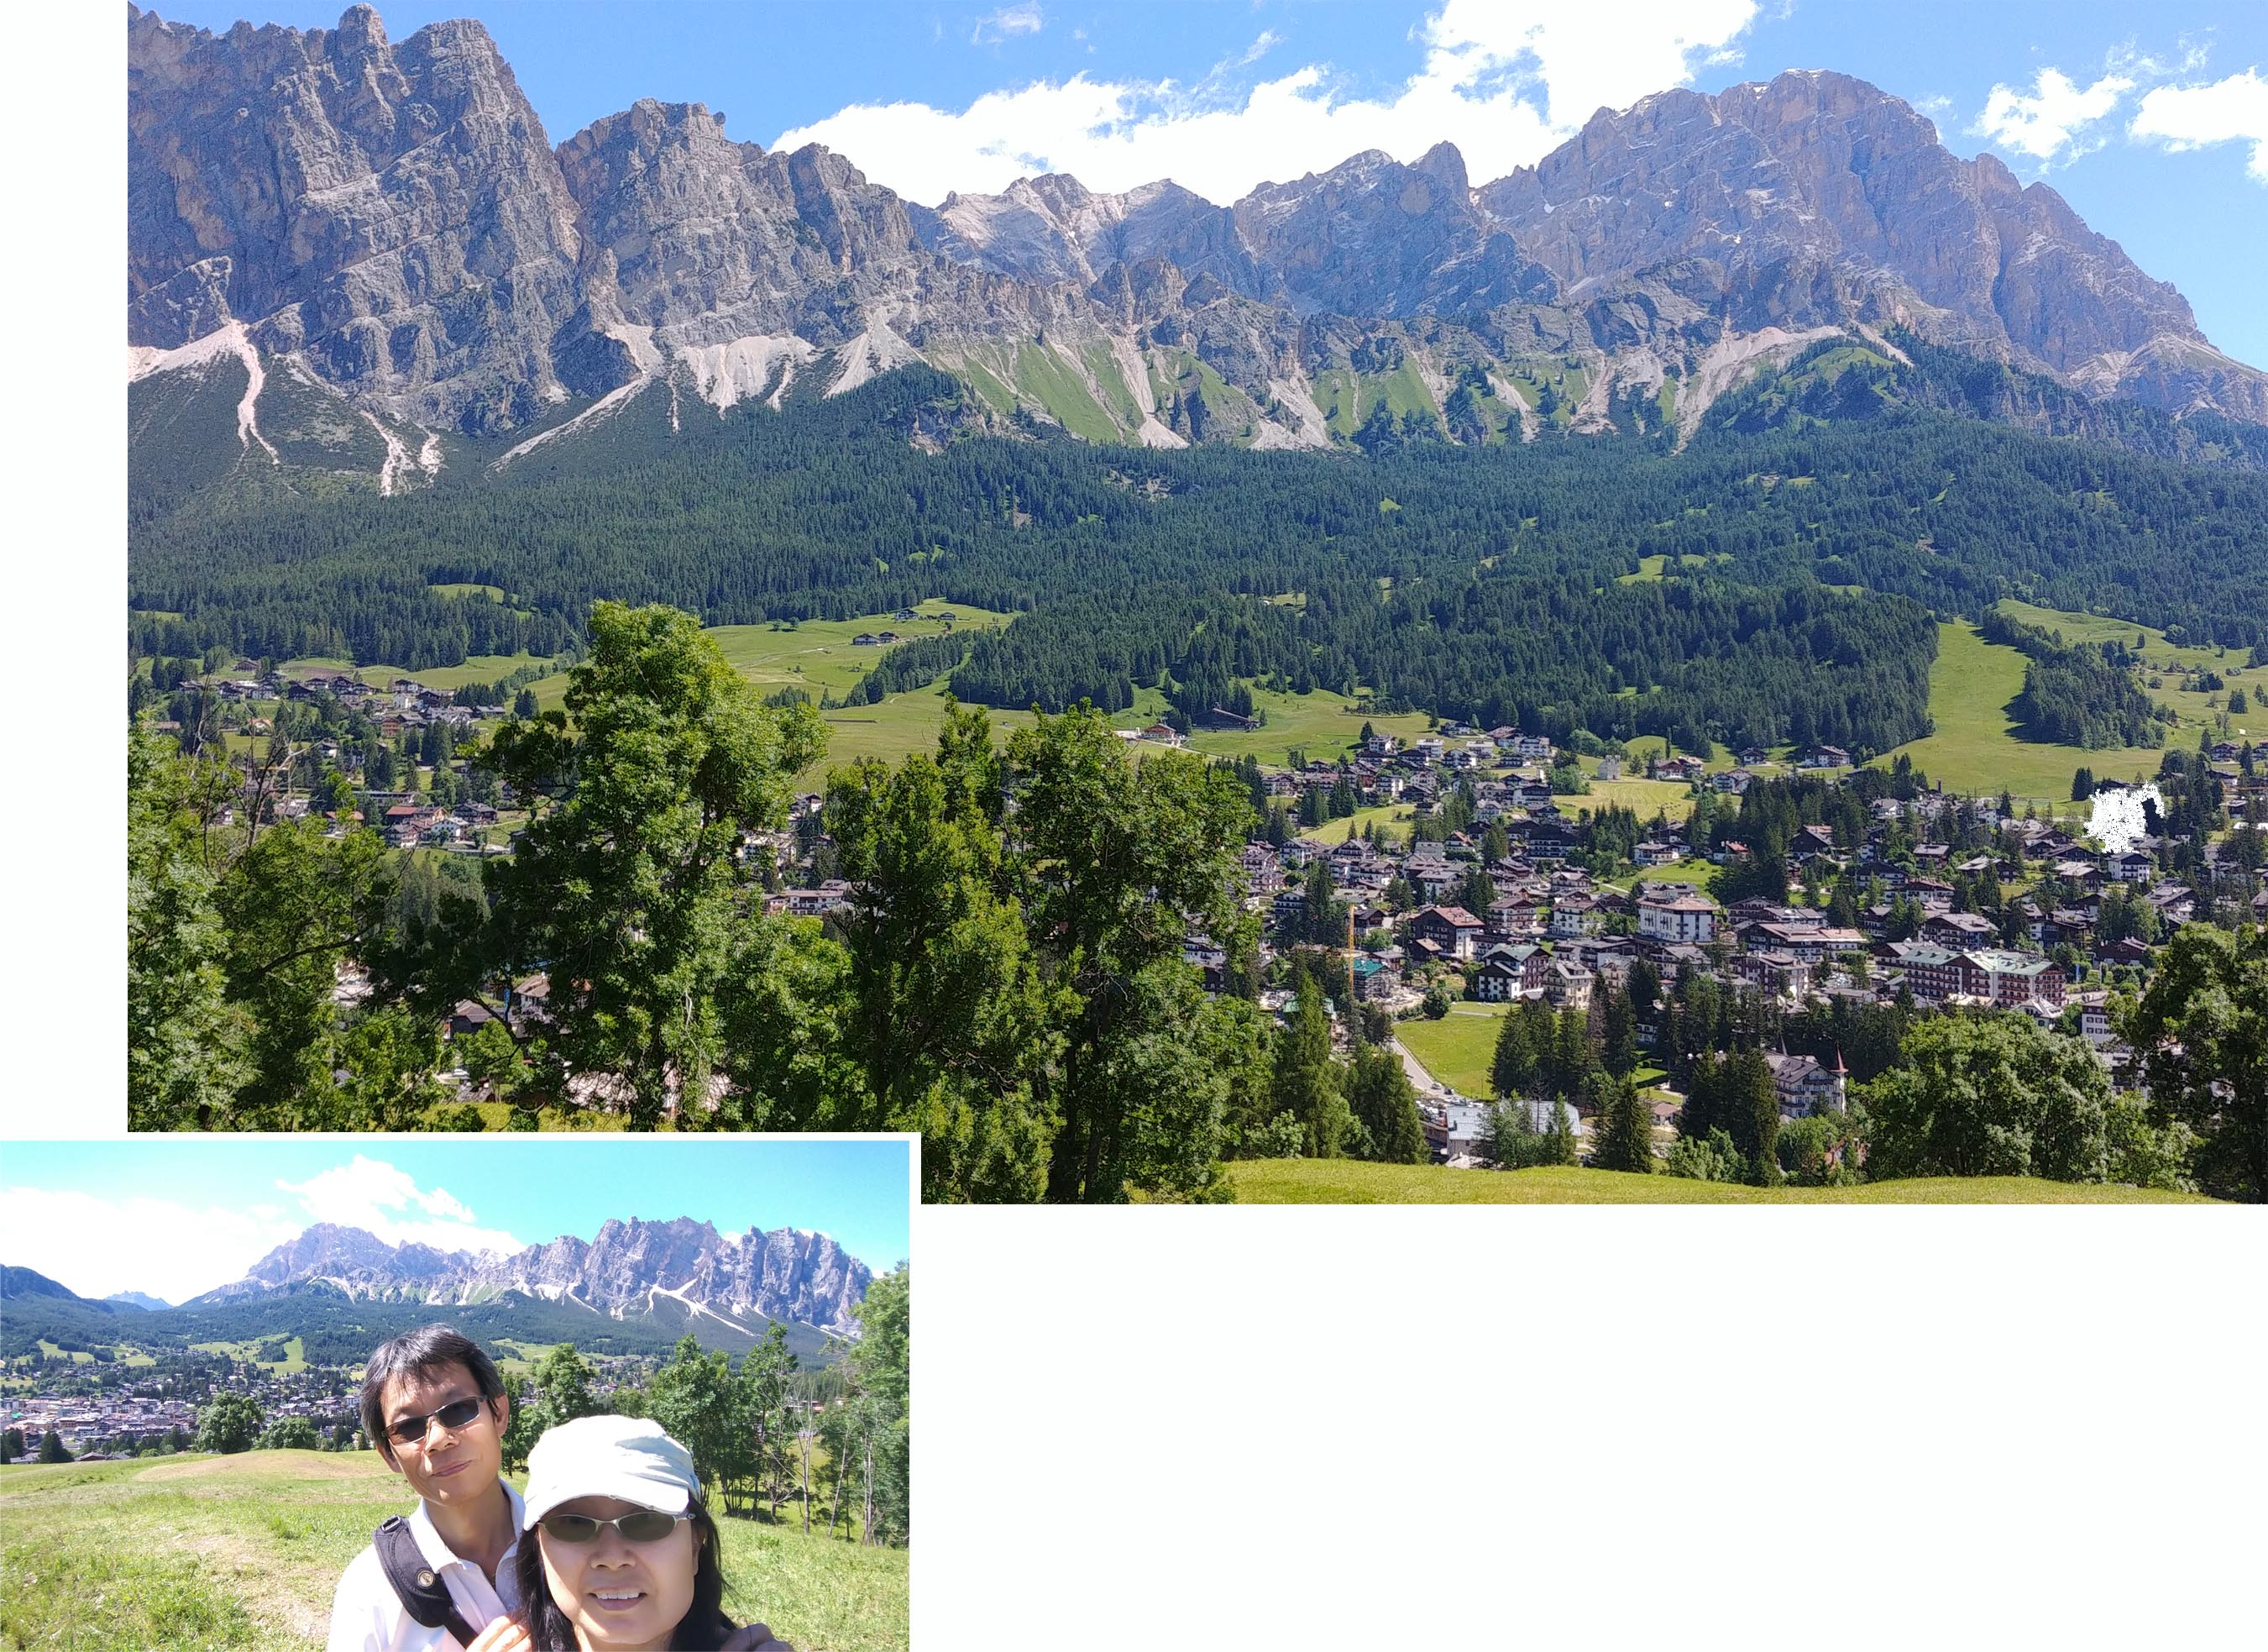 Dolomites towering above Cortina d' Ampezzo